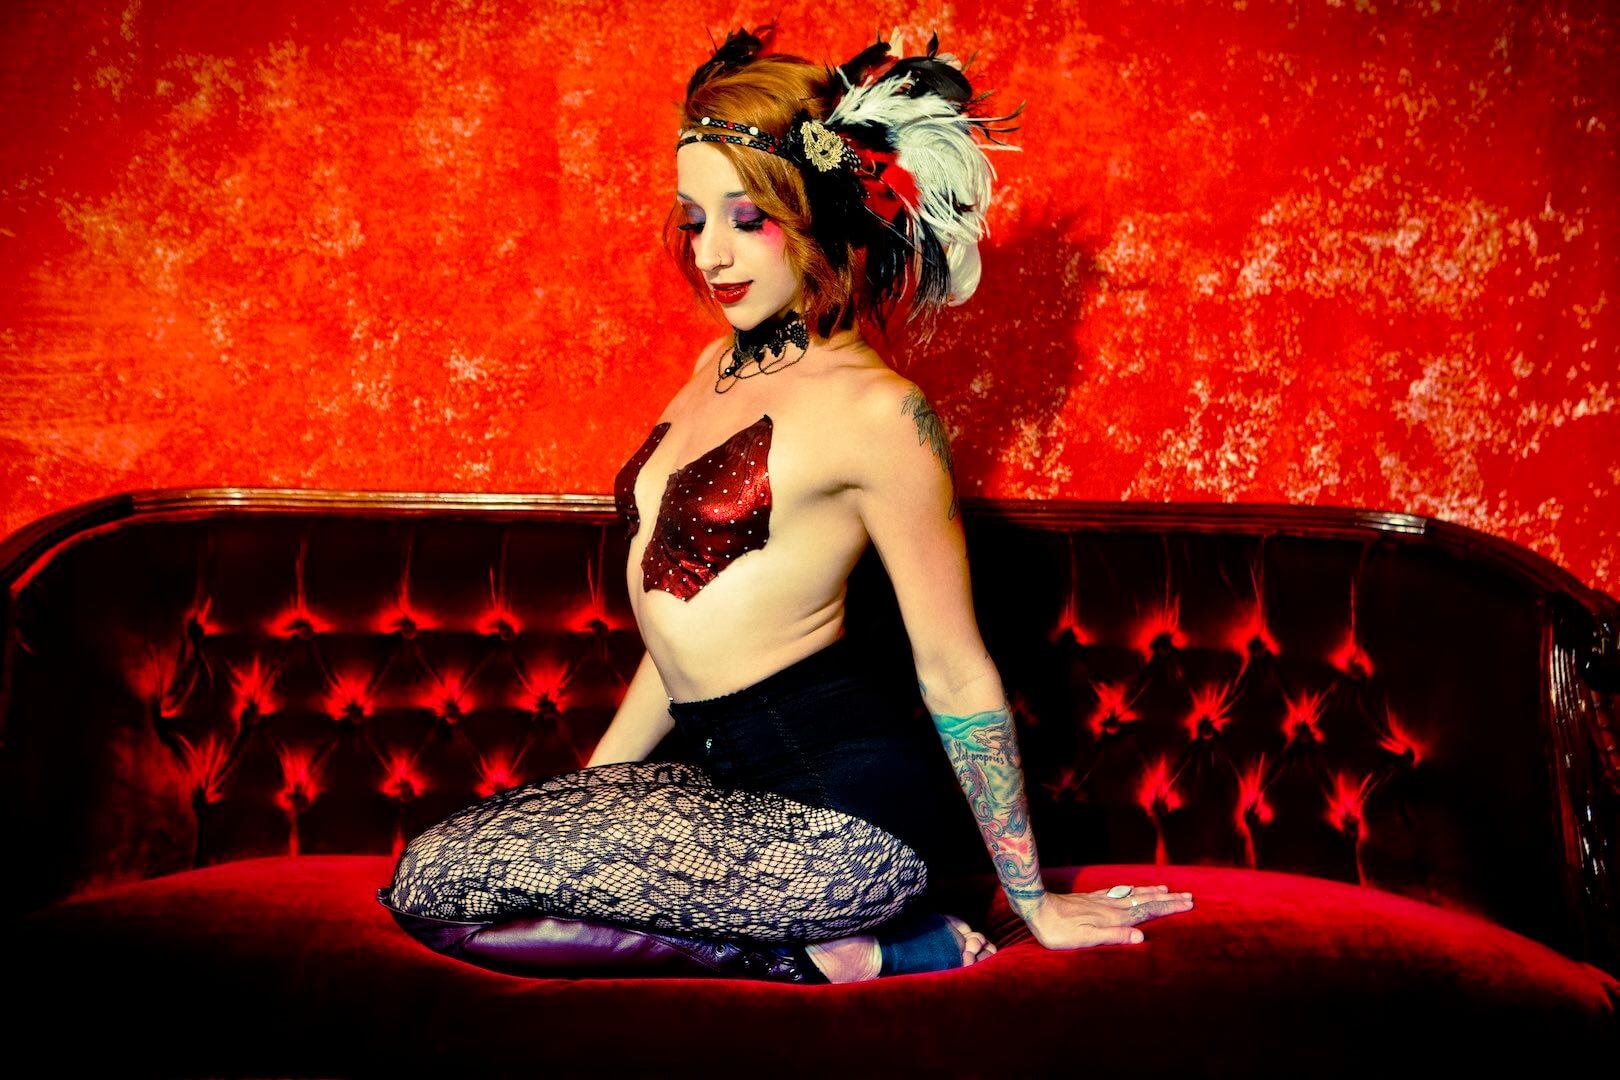 Tina Phoenix by Sam Fielding